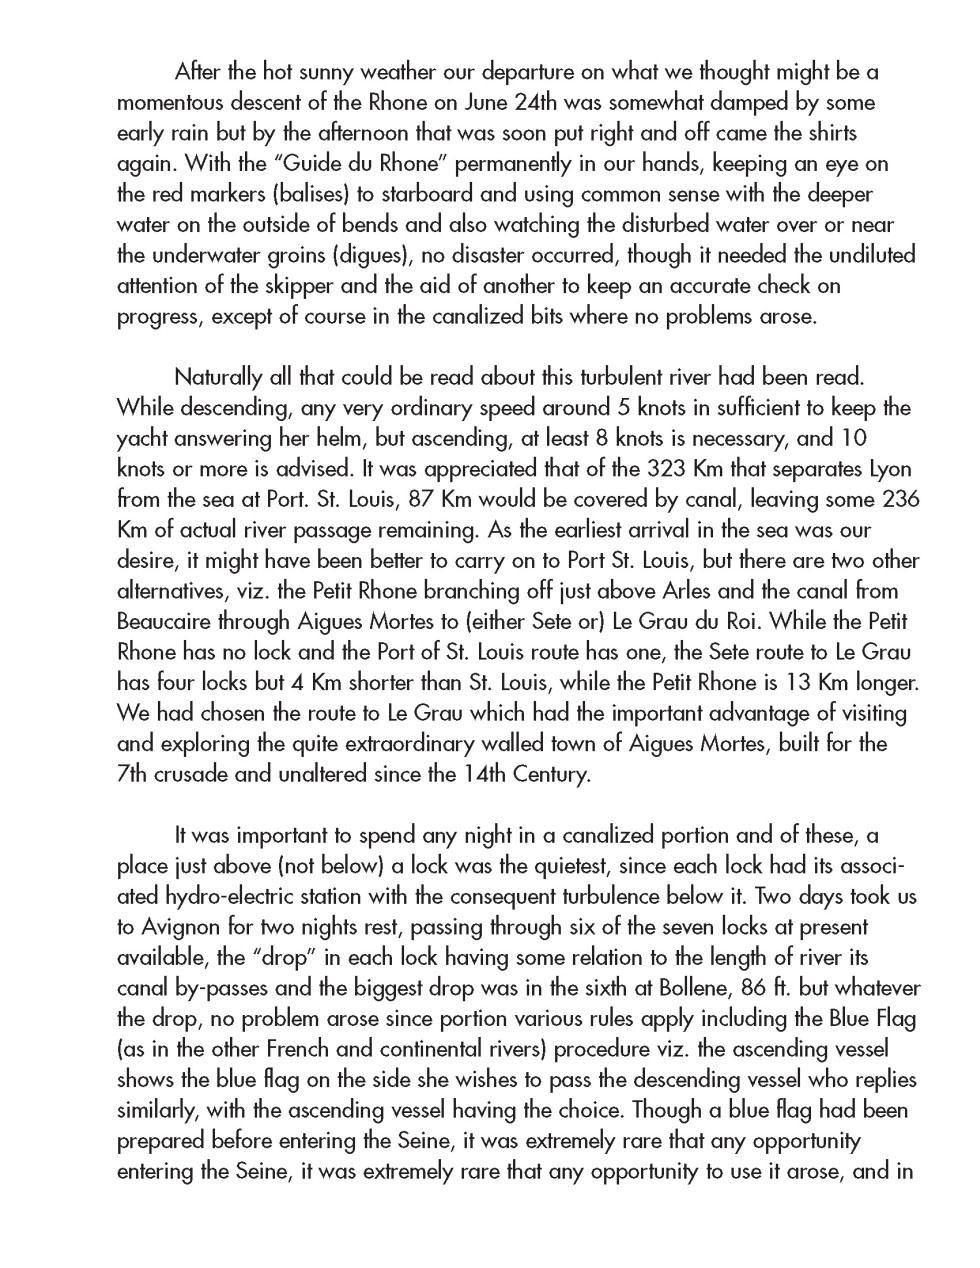 Narrative1971_Page_09